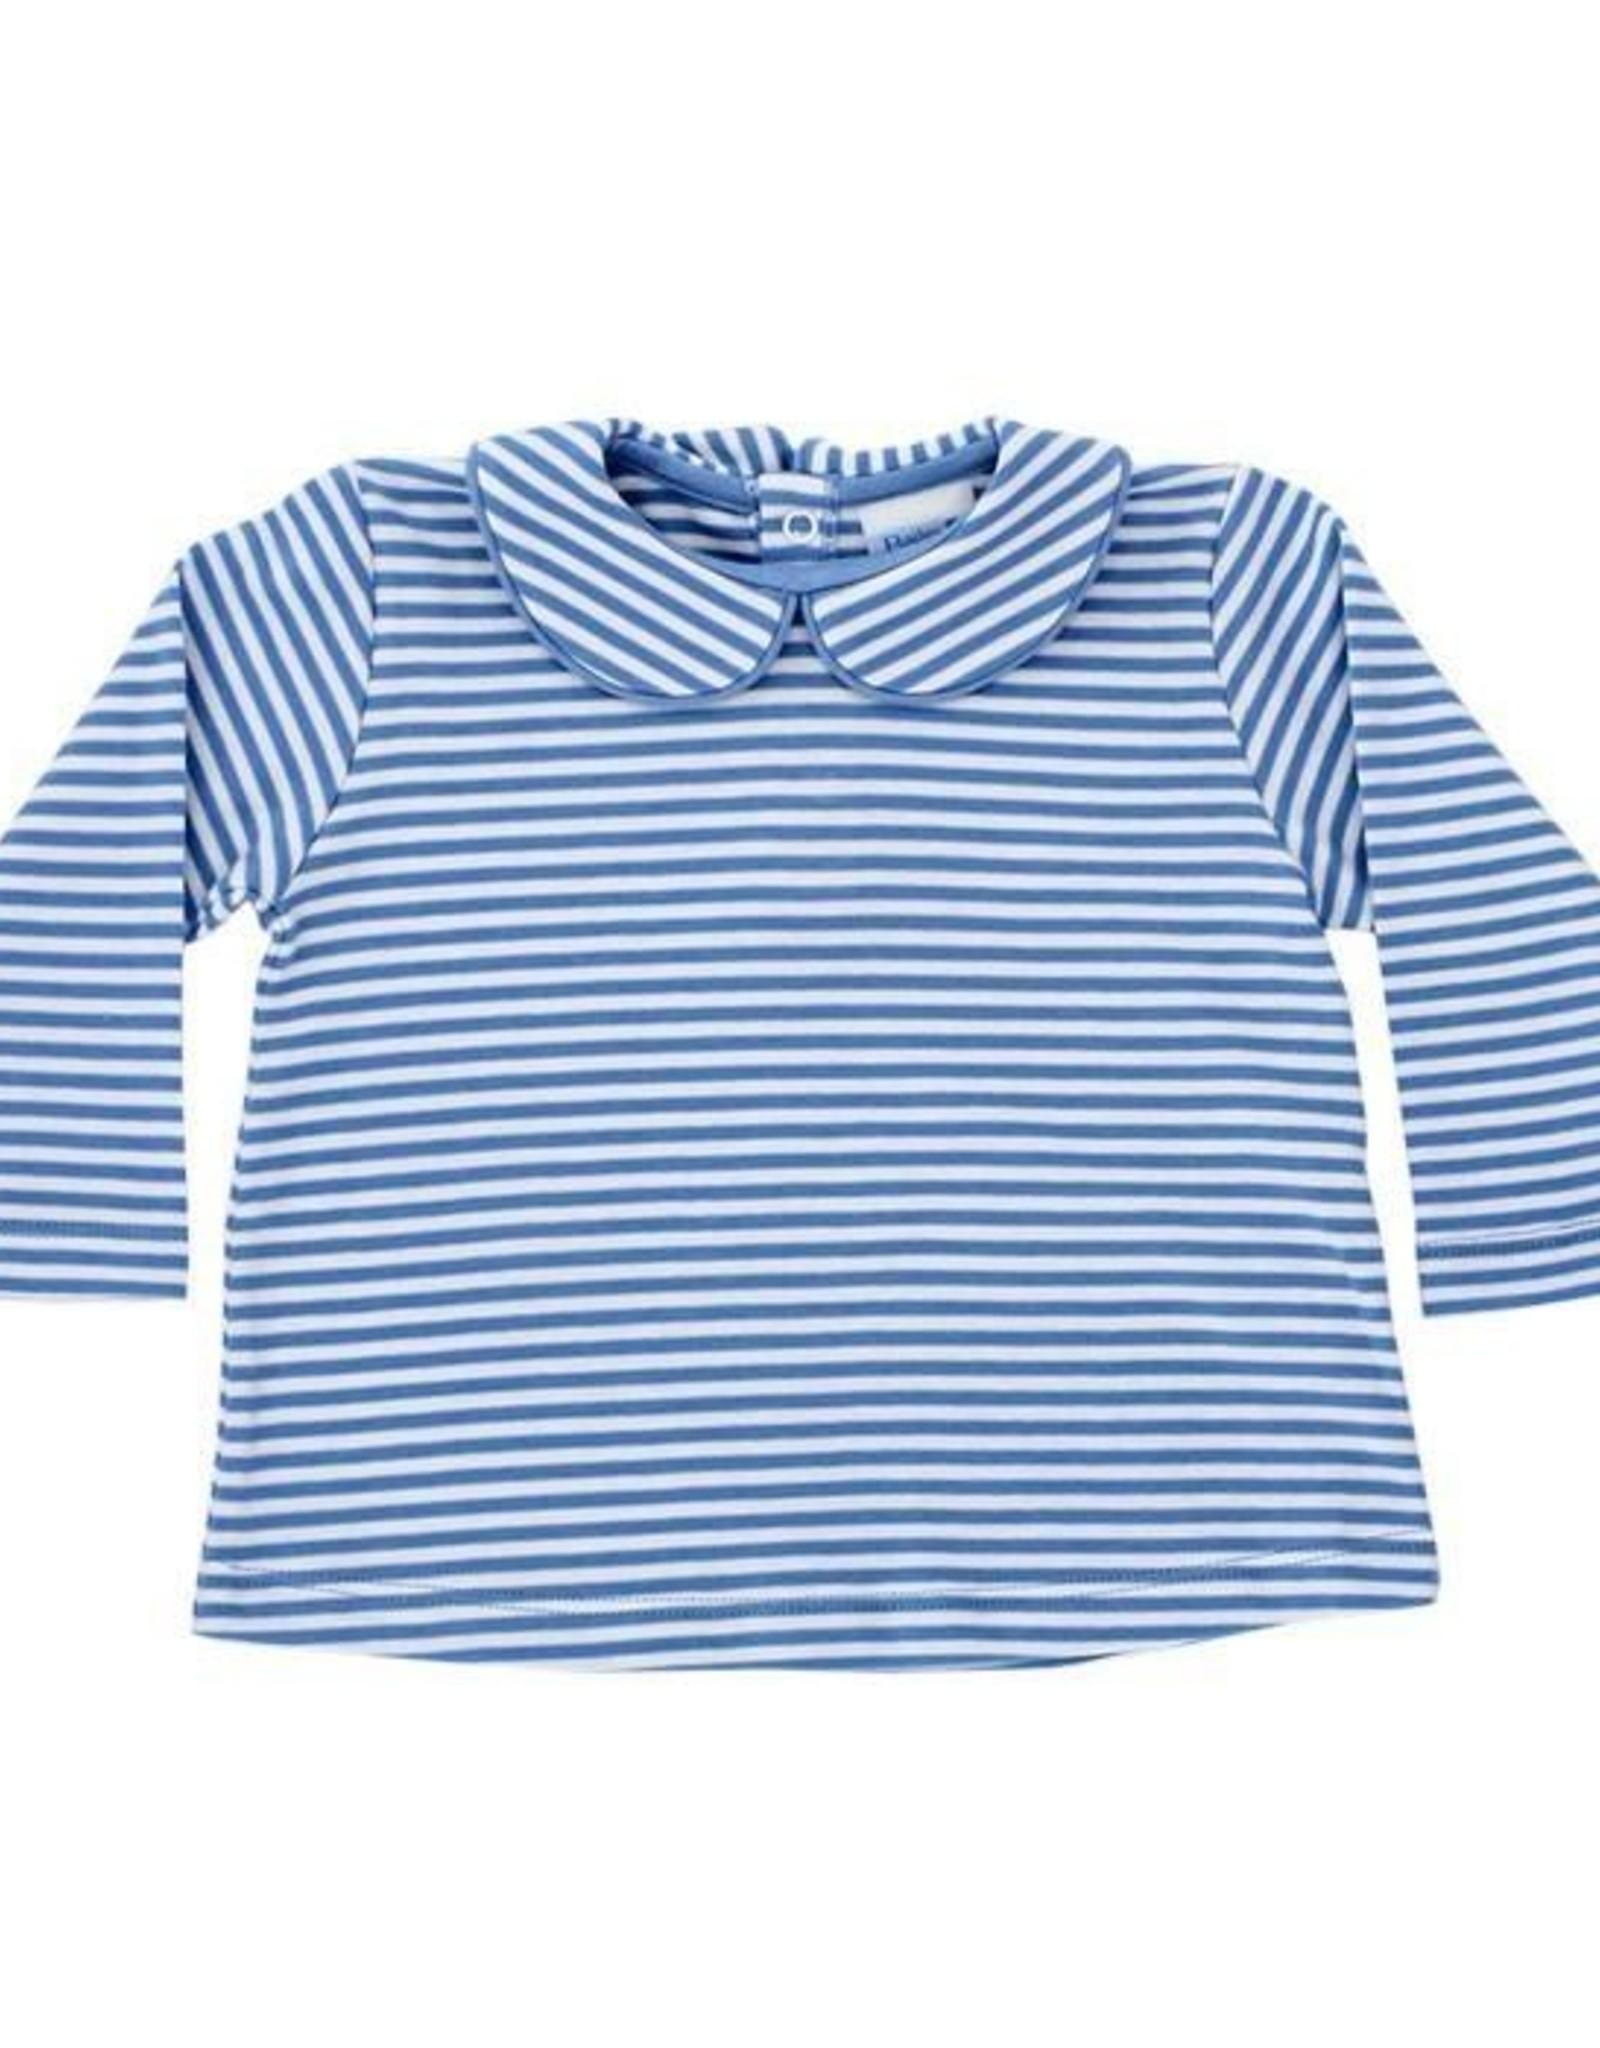 The Bailey Boys Button Back Knit Shirt, Blue Stripe